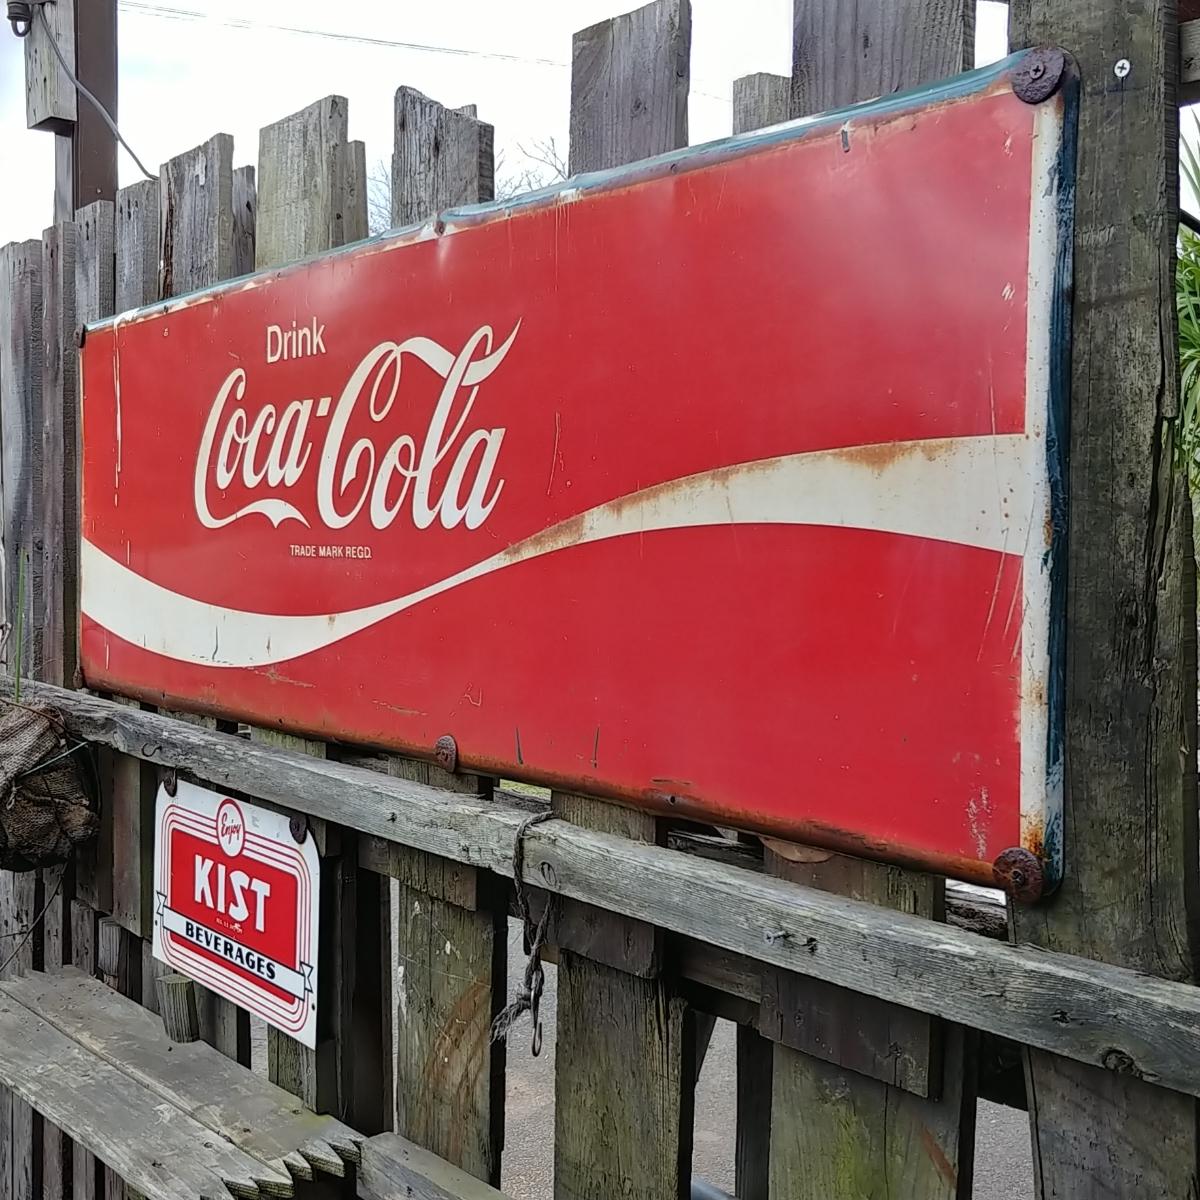 ☆AMERICAN VINTAGE SING☆Coca-Cola (コカ・コーラ)大型 フロント看板(非売品)#店舗什器#世田谷ベース #ガレージライフ_画像10